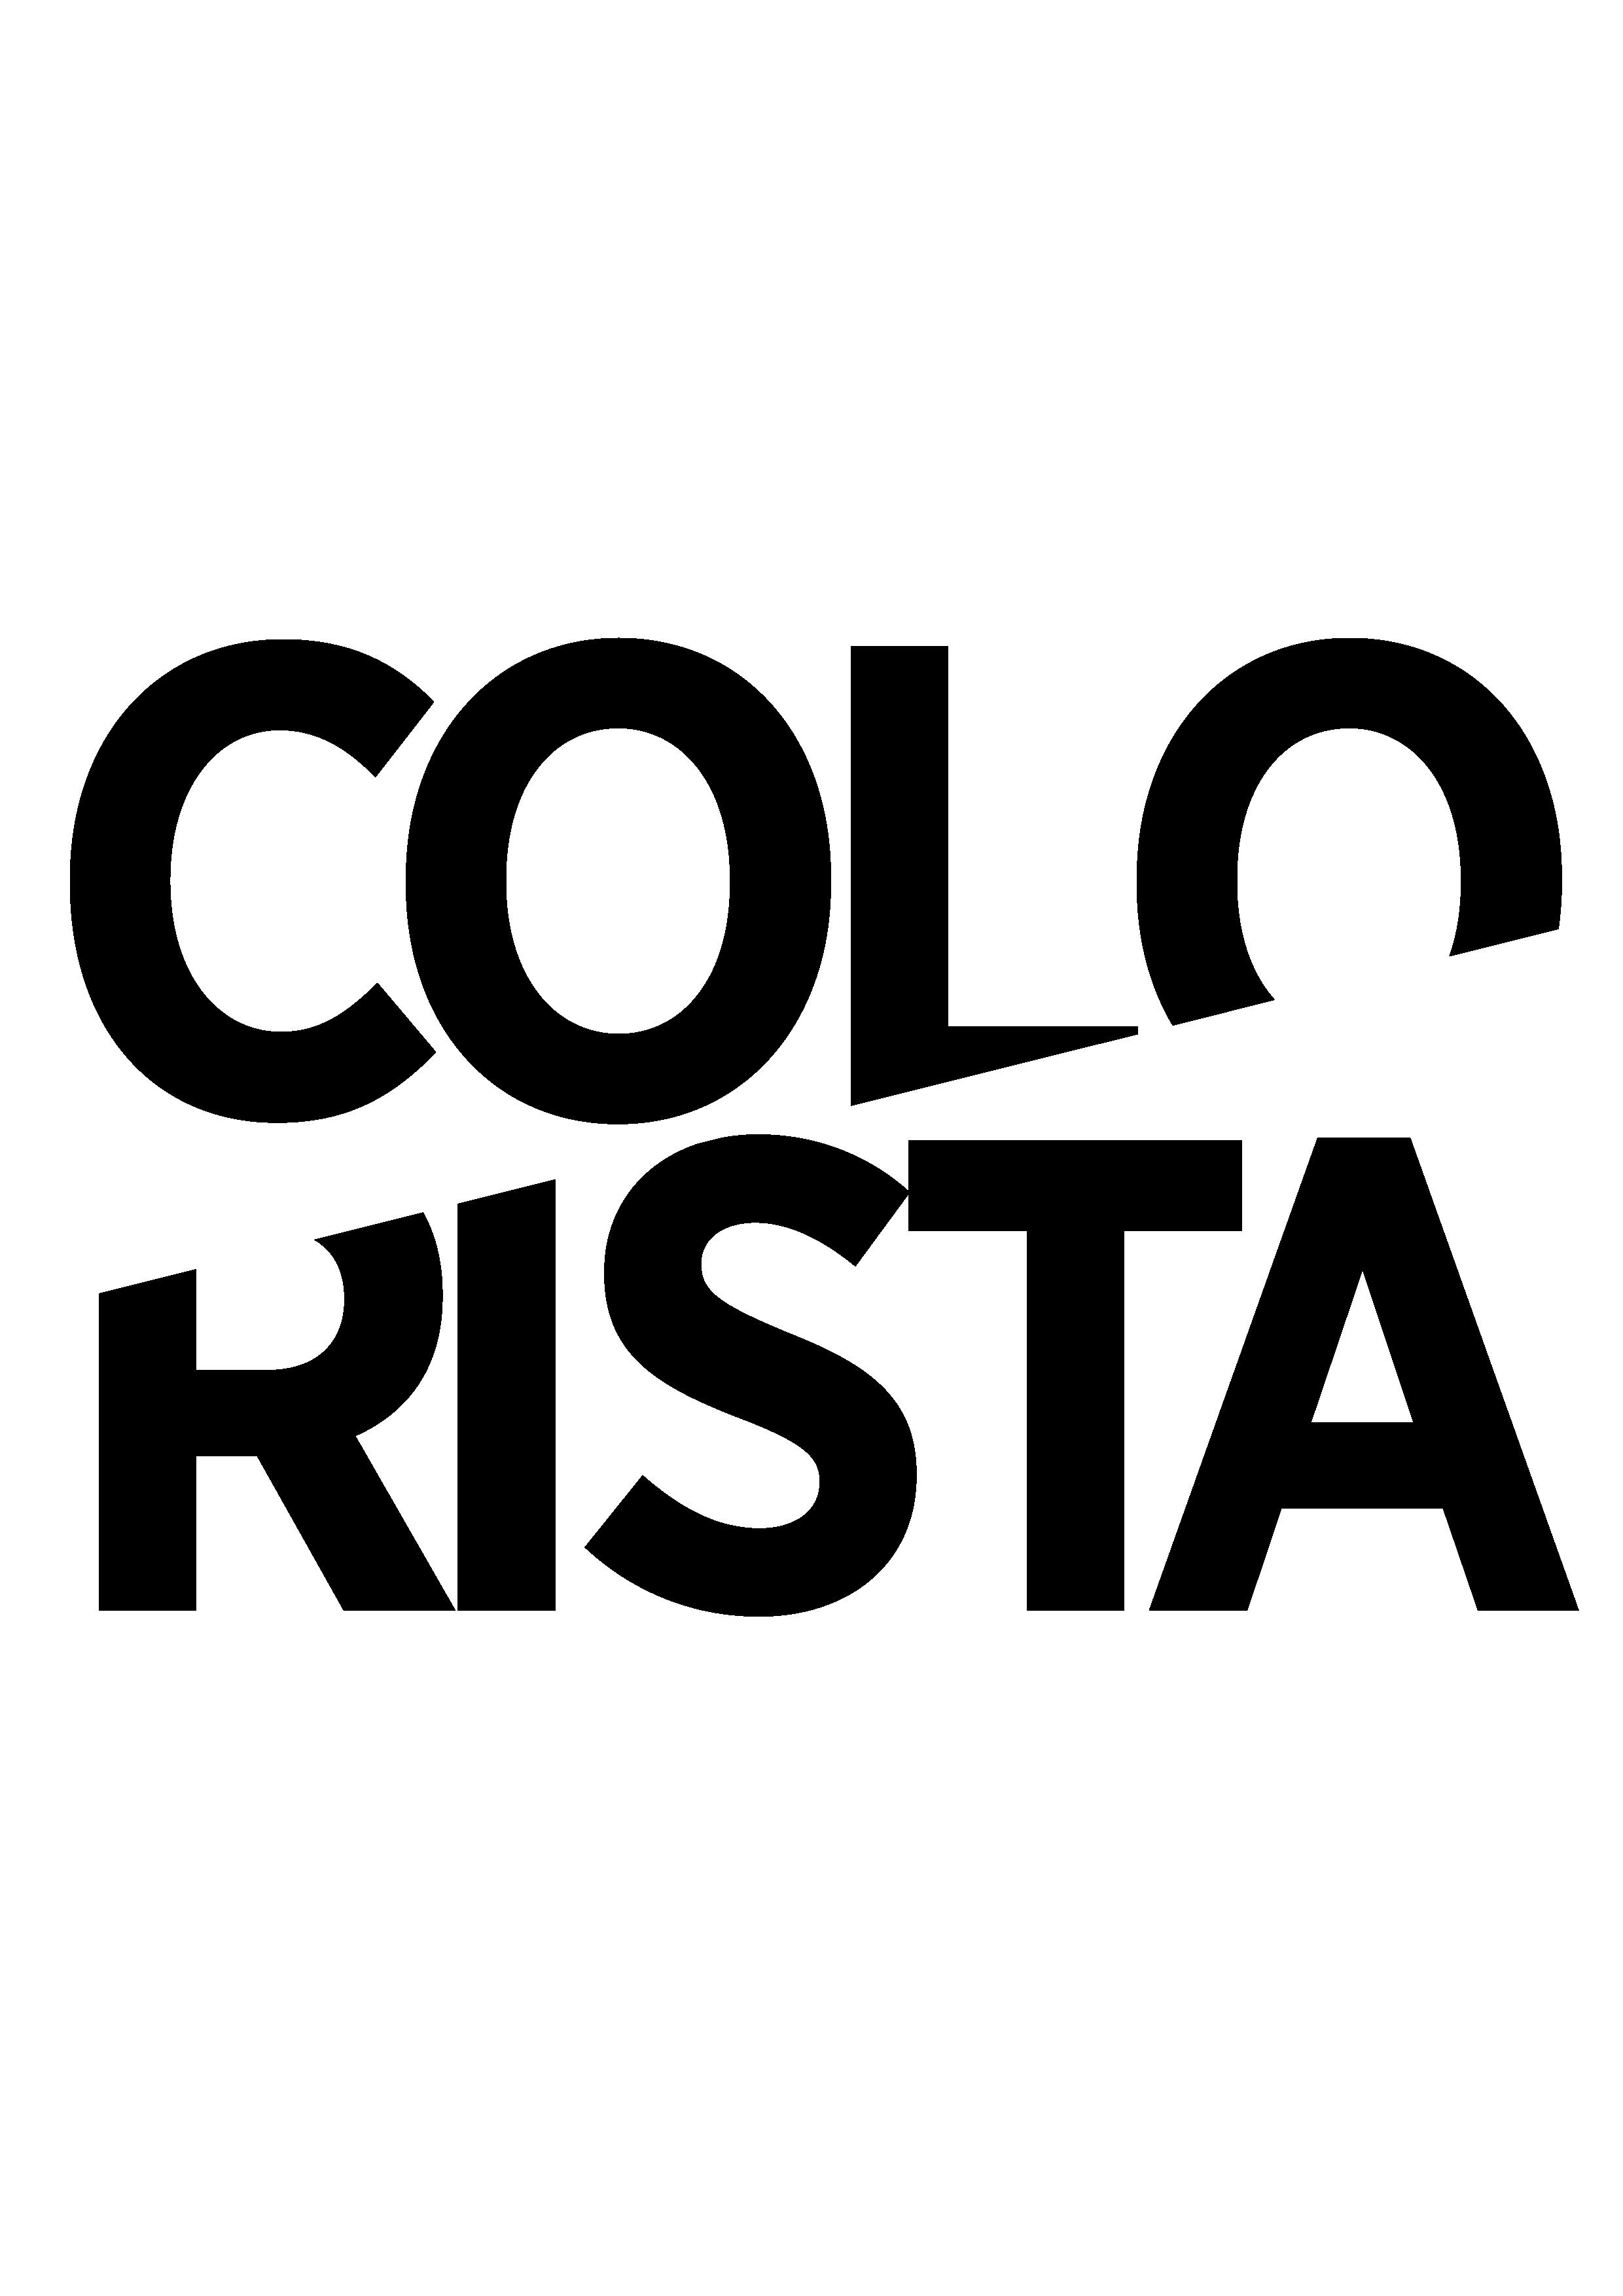 Colorista